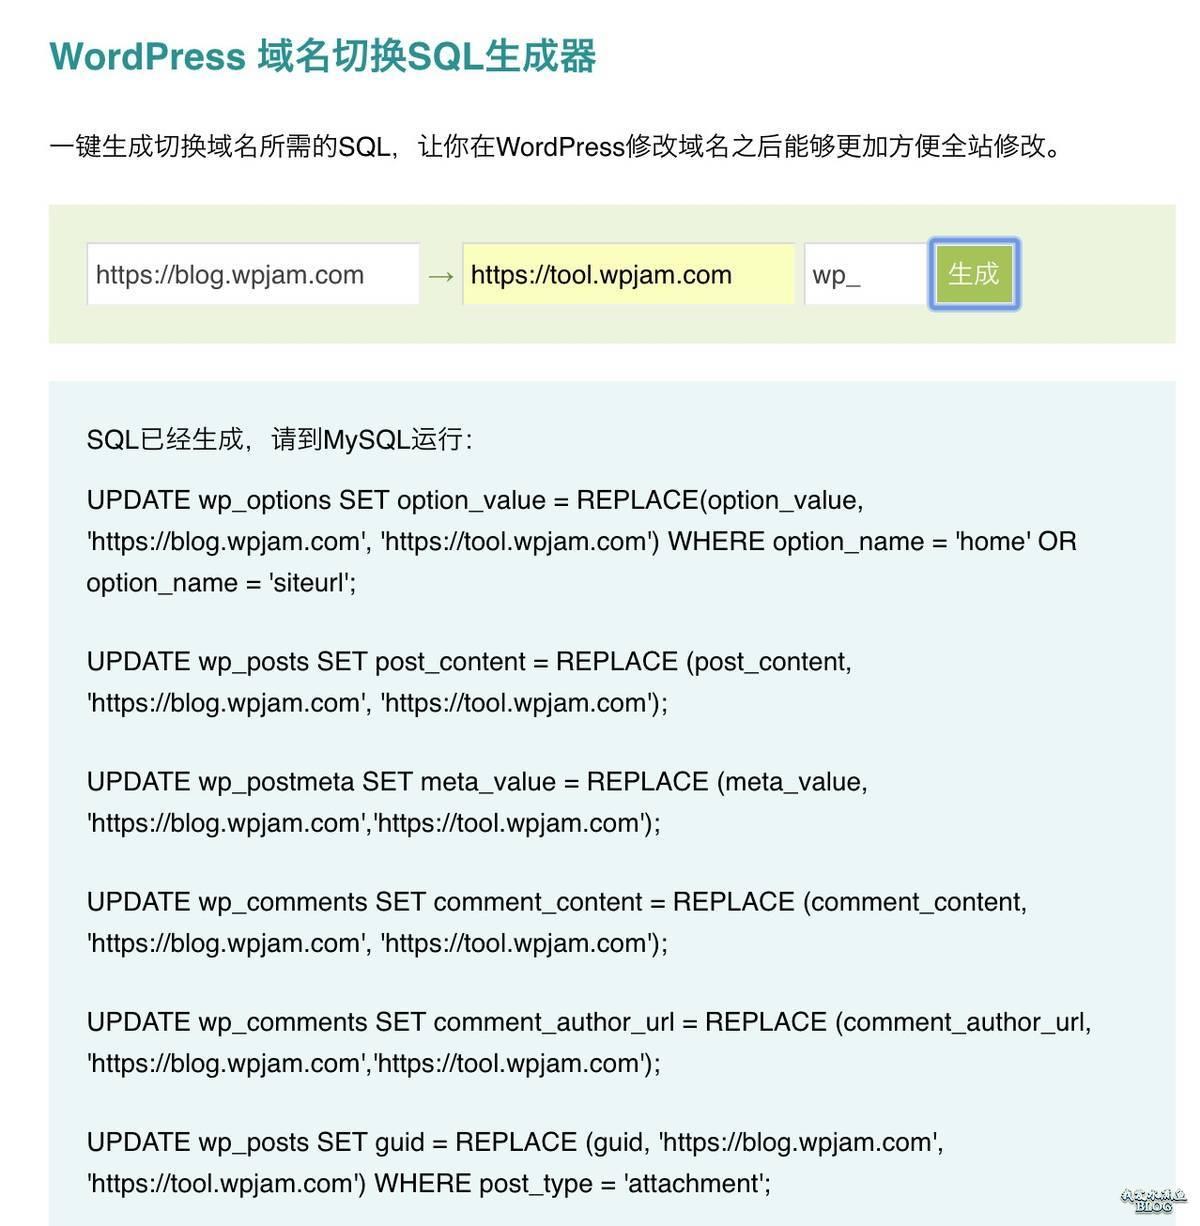 WordPress 工具:域名切换SQL生成器